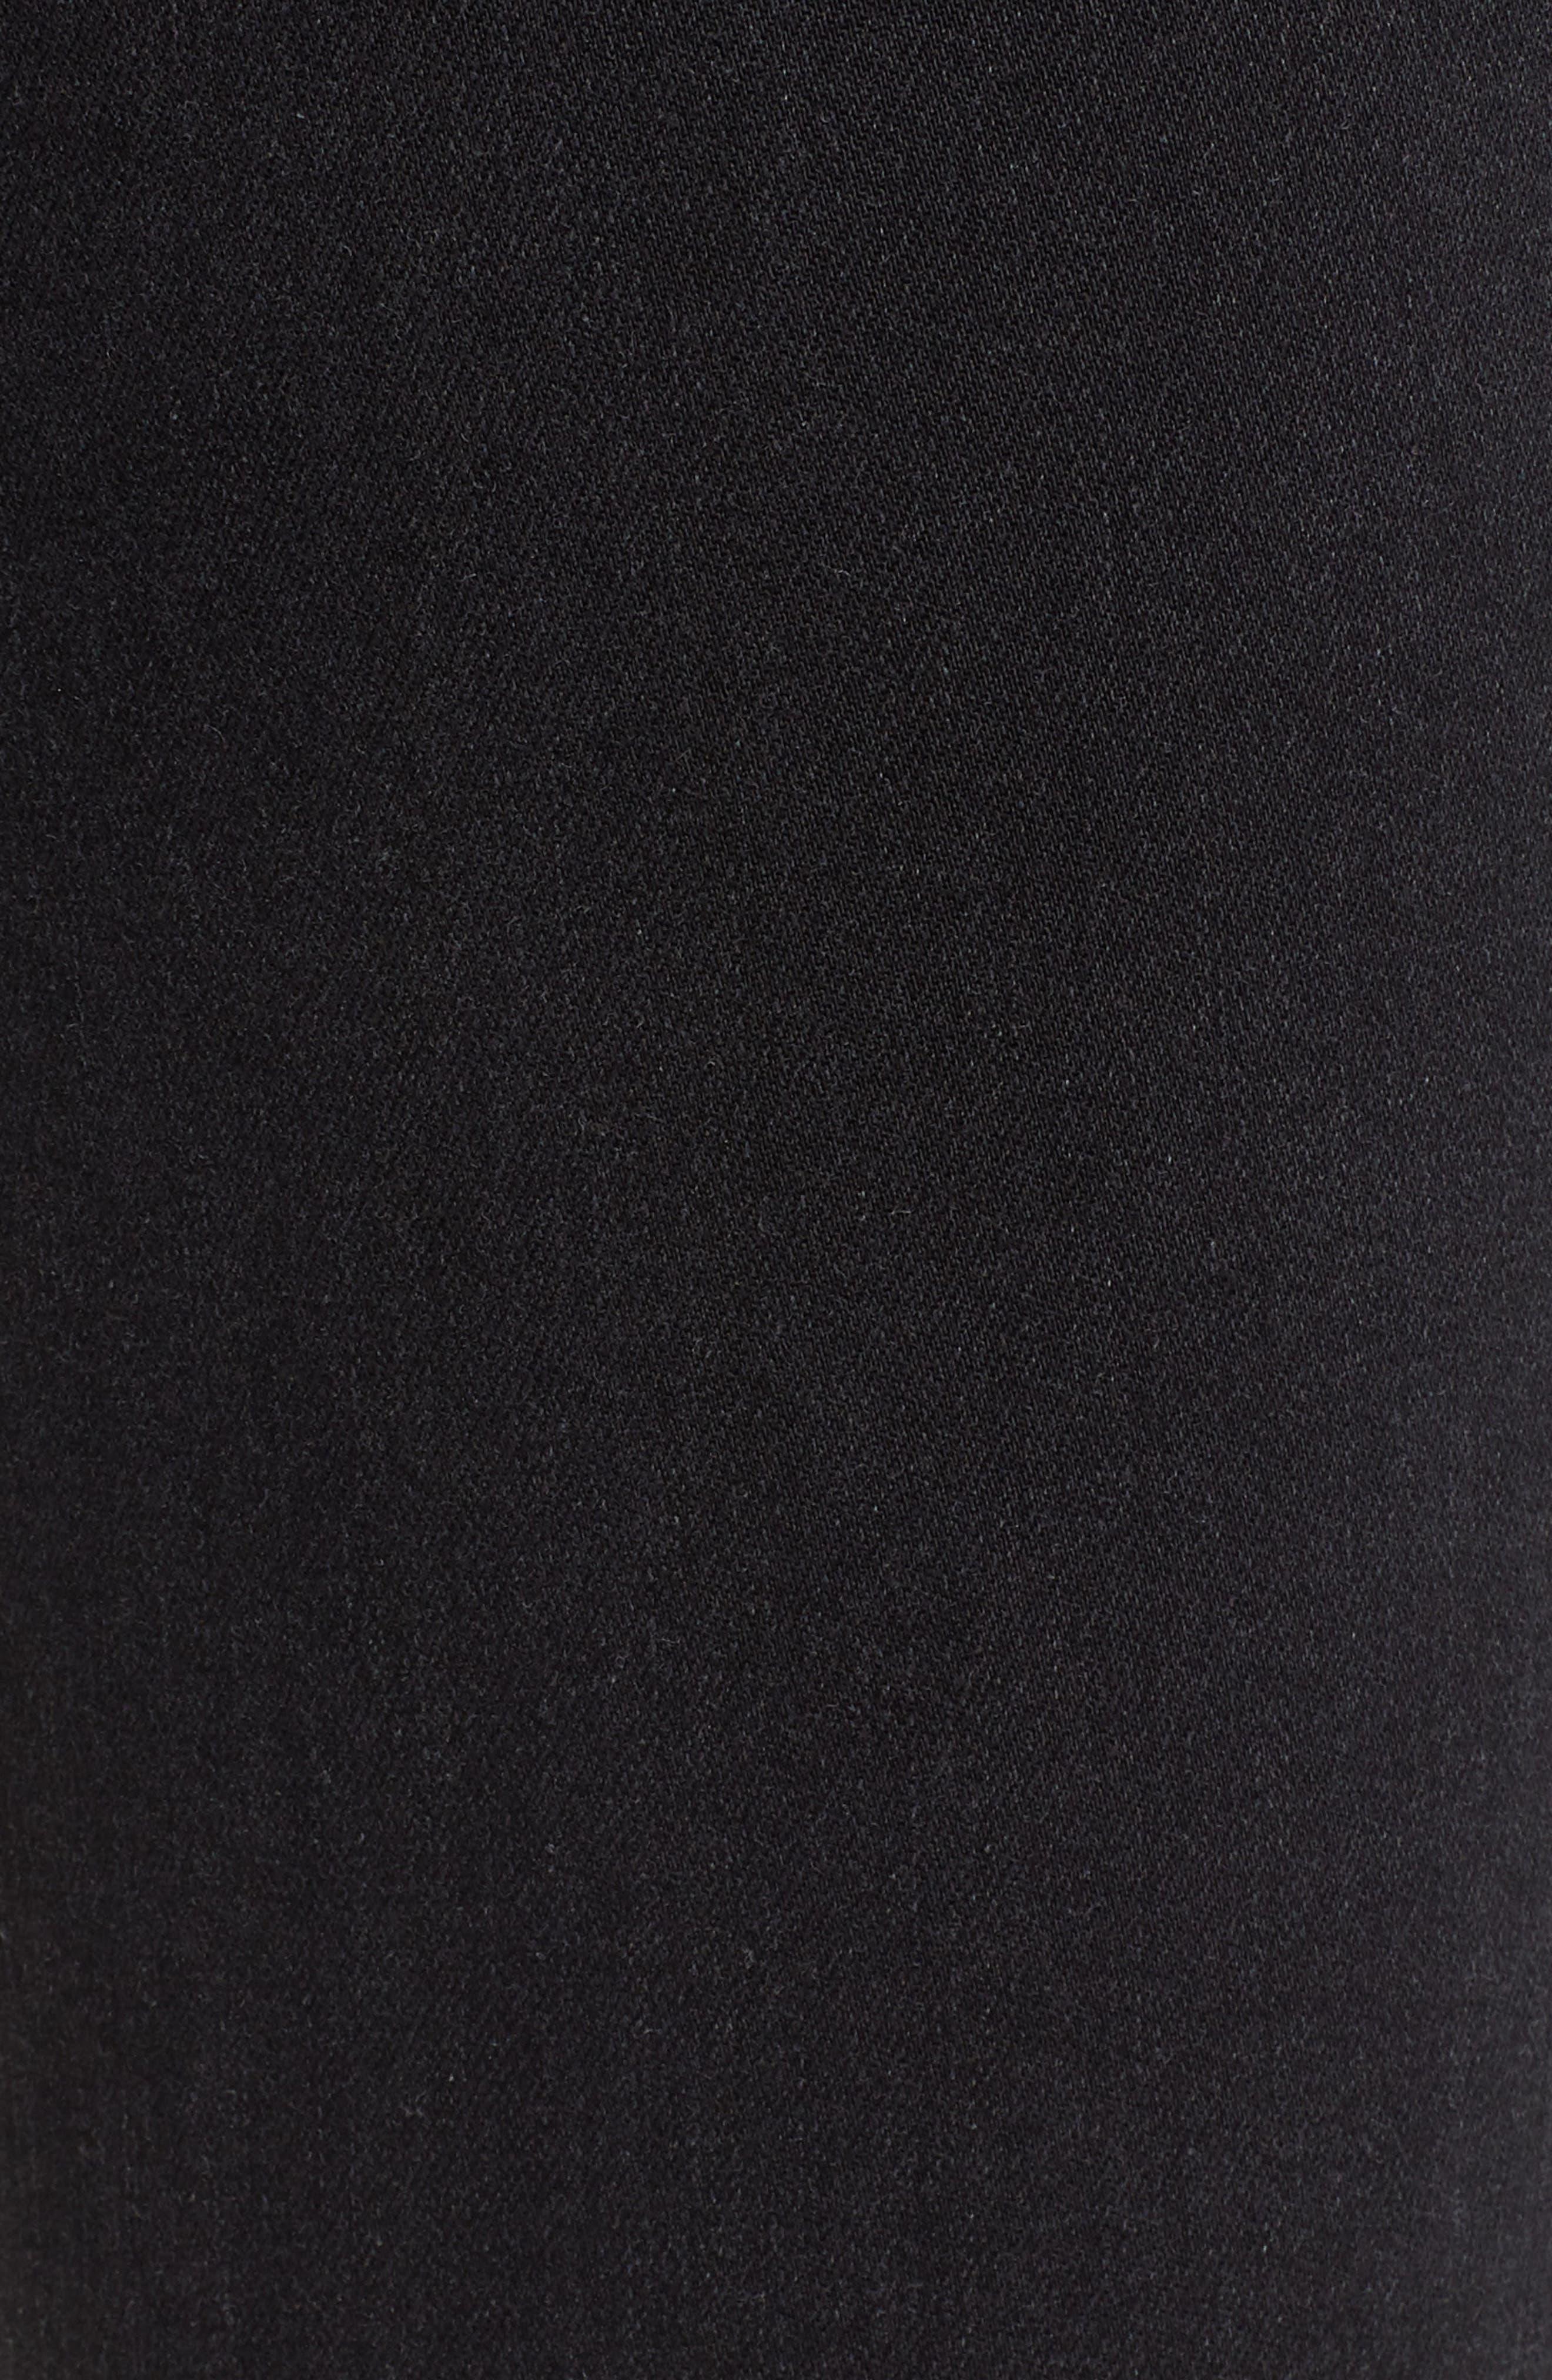 Hoxton Utilitarian High Waist Ankle Skinny Jeans,                             Alternate thumbnail 6, color,                             BLACK FOG RAW HEM